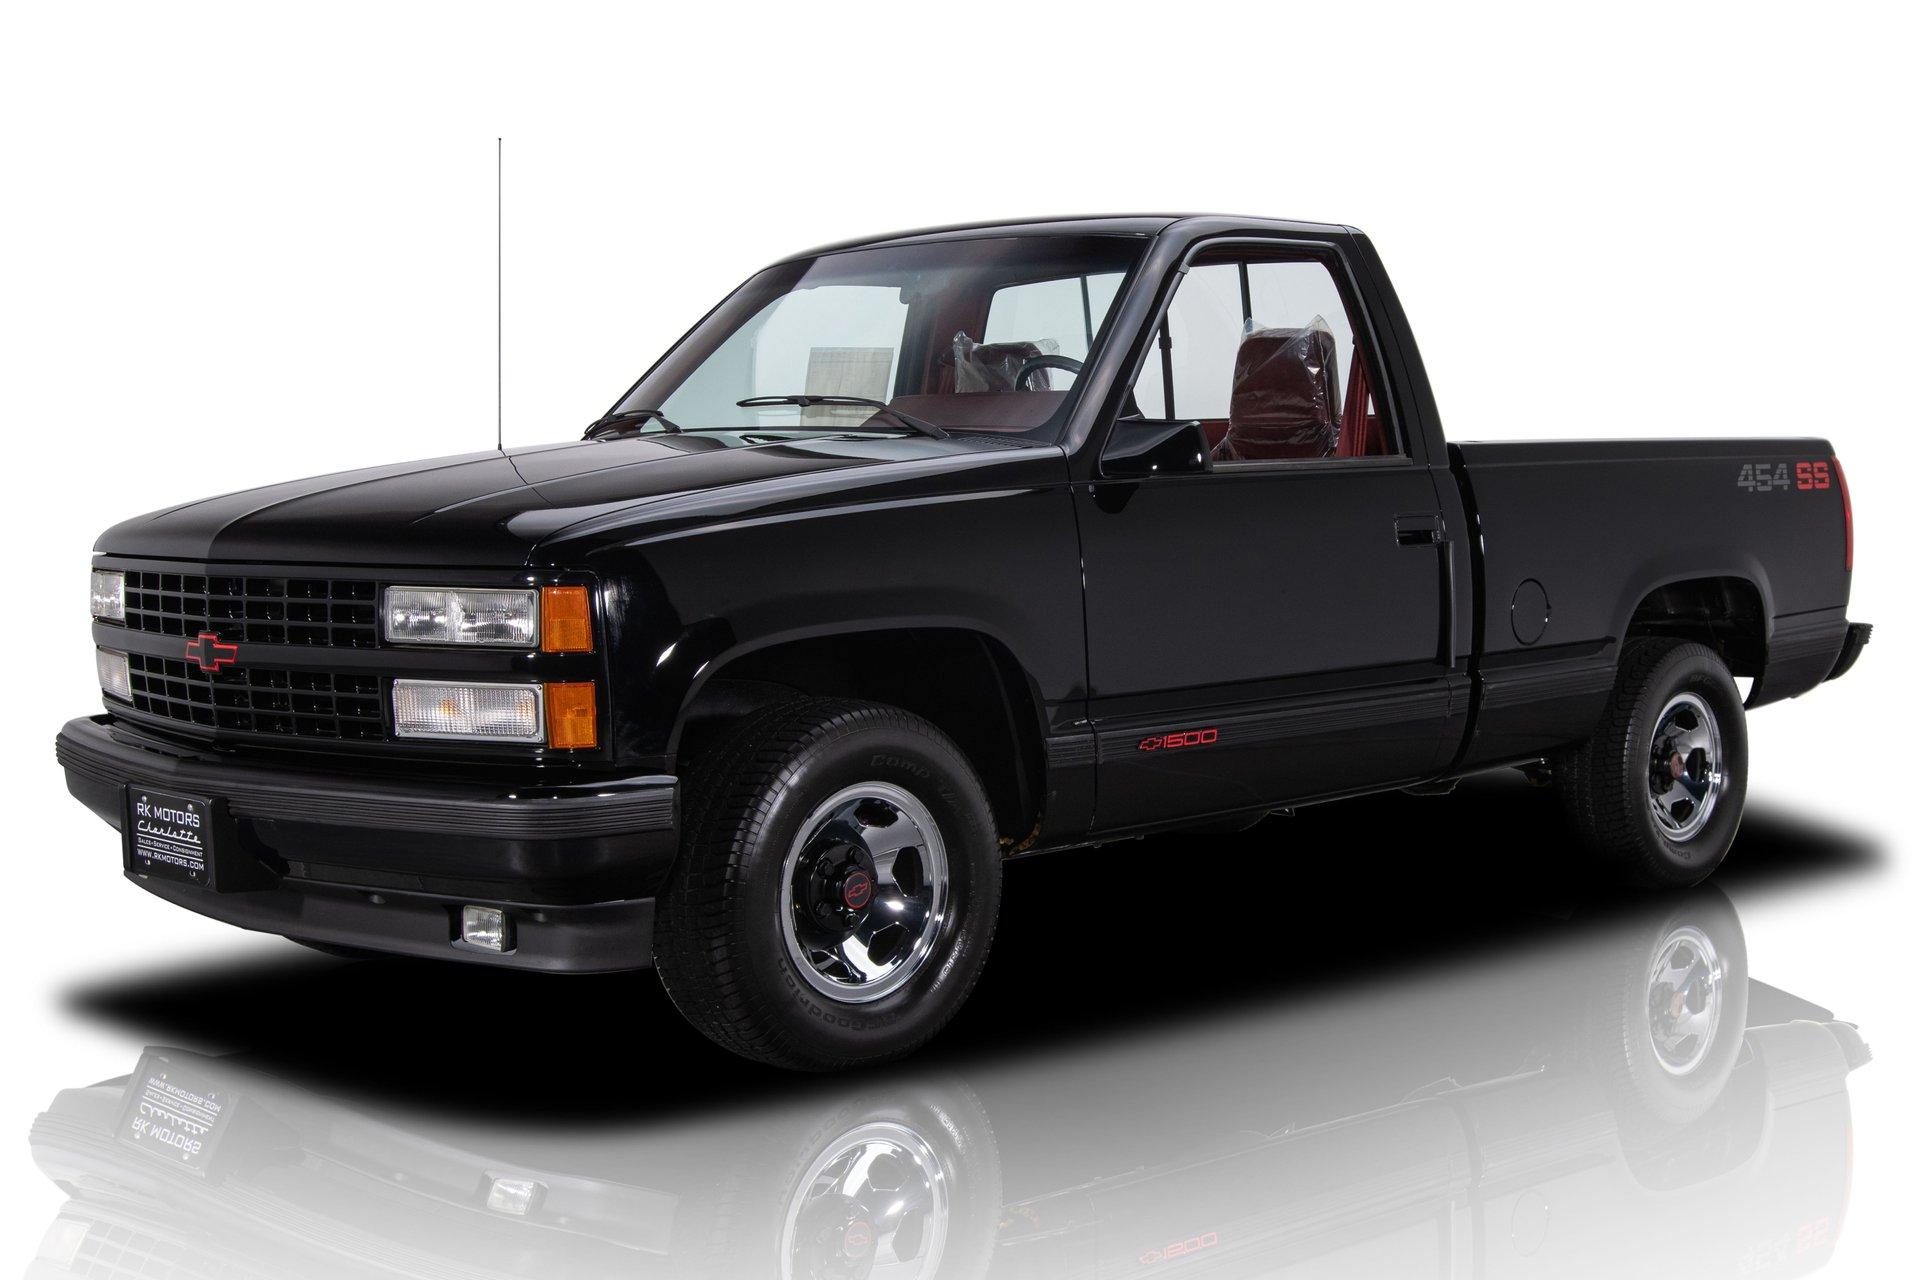 1990 chevrolet c 1500 454 ss pickup truck